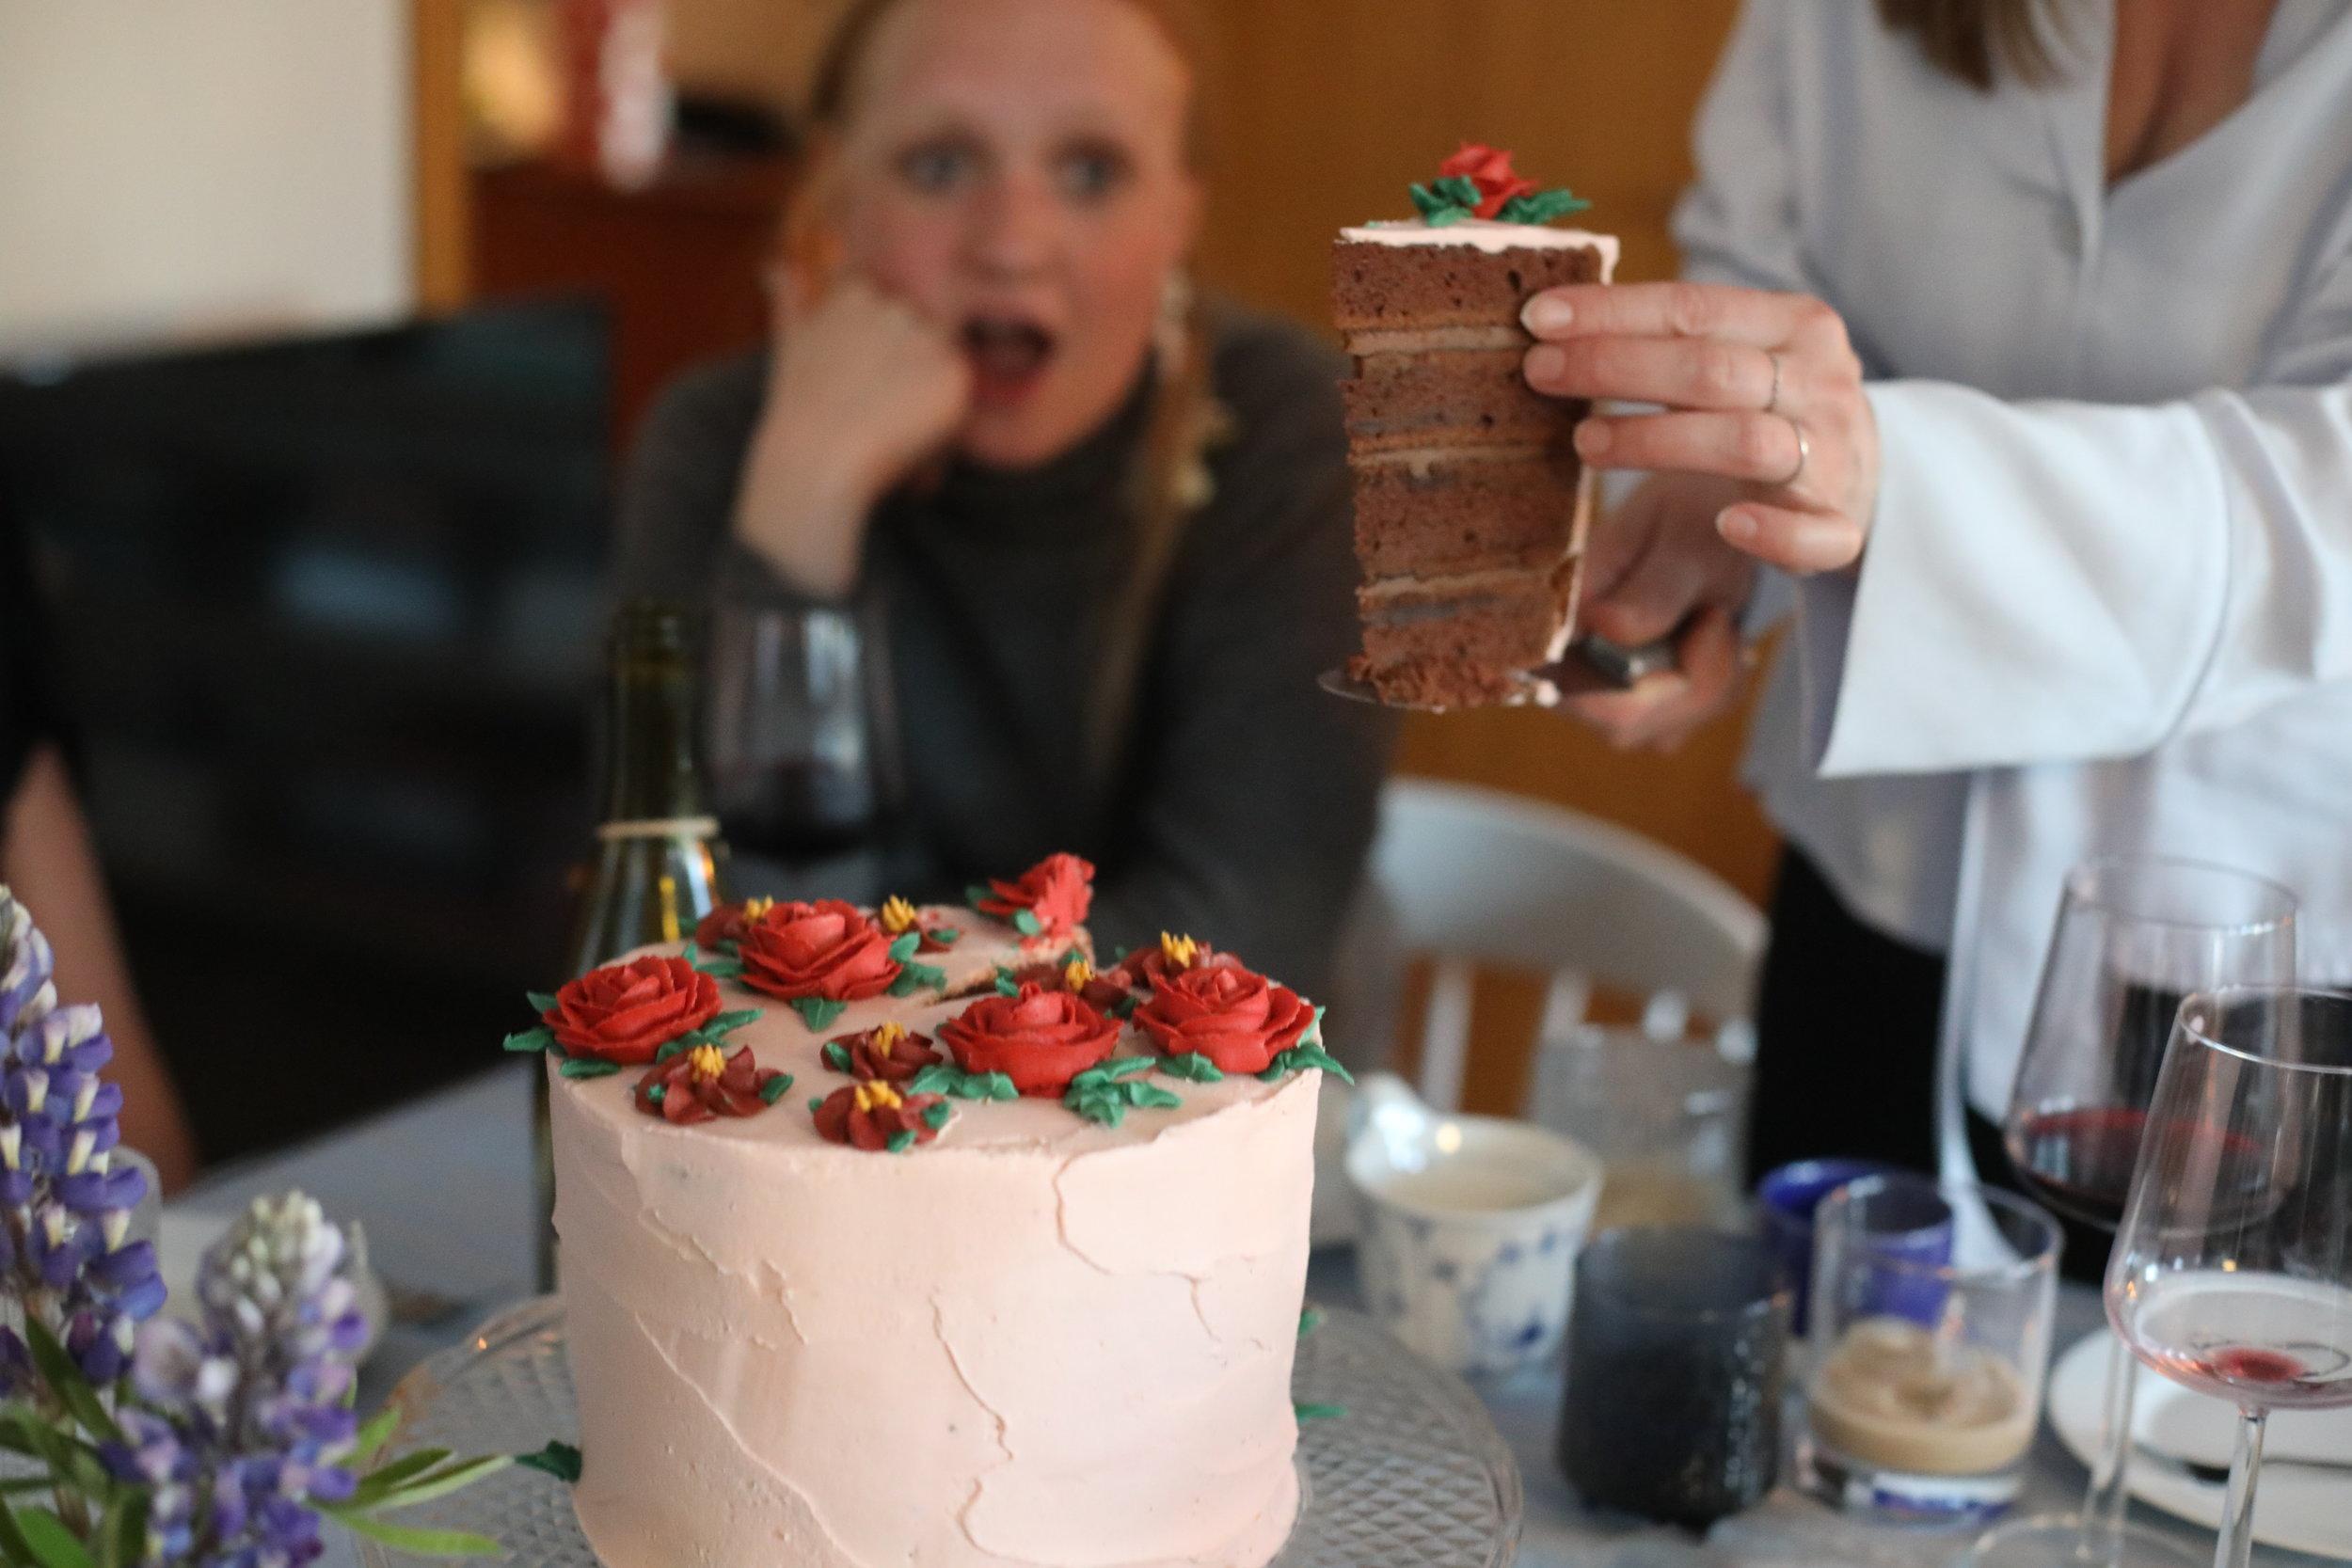 cake-birtdhay-afmæli-afmæliskaka-birthdaycake